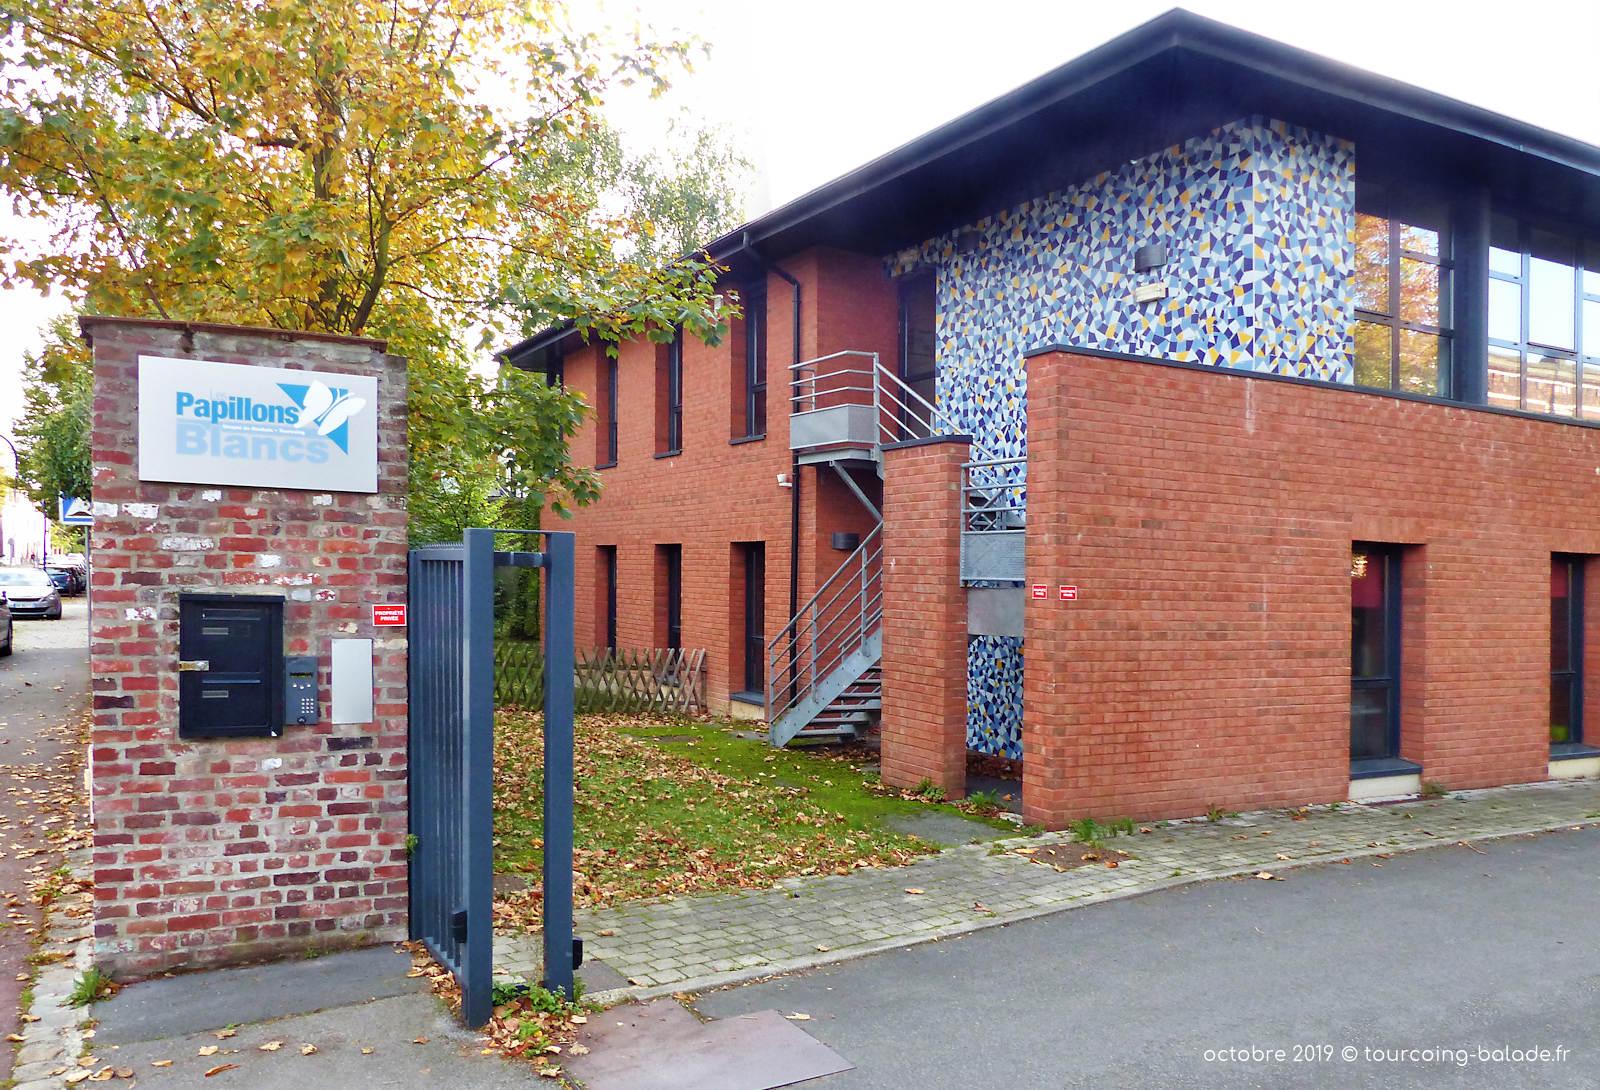 Papillons Blancs, Centre Habitat Langevin, Tourcoing.